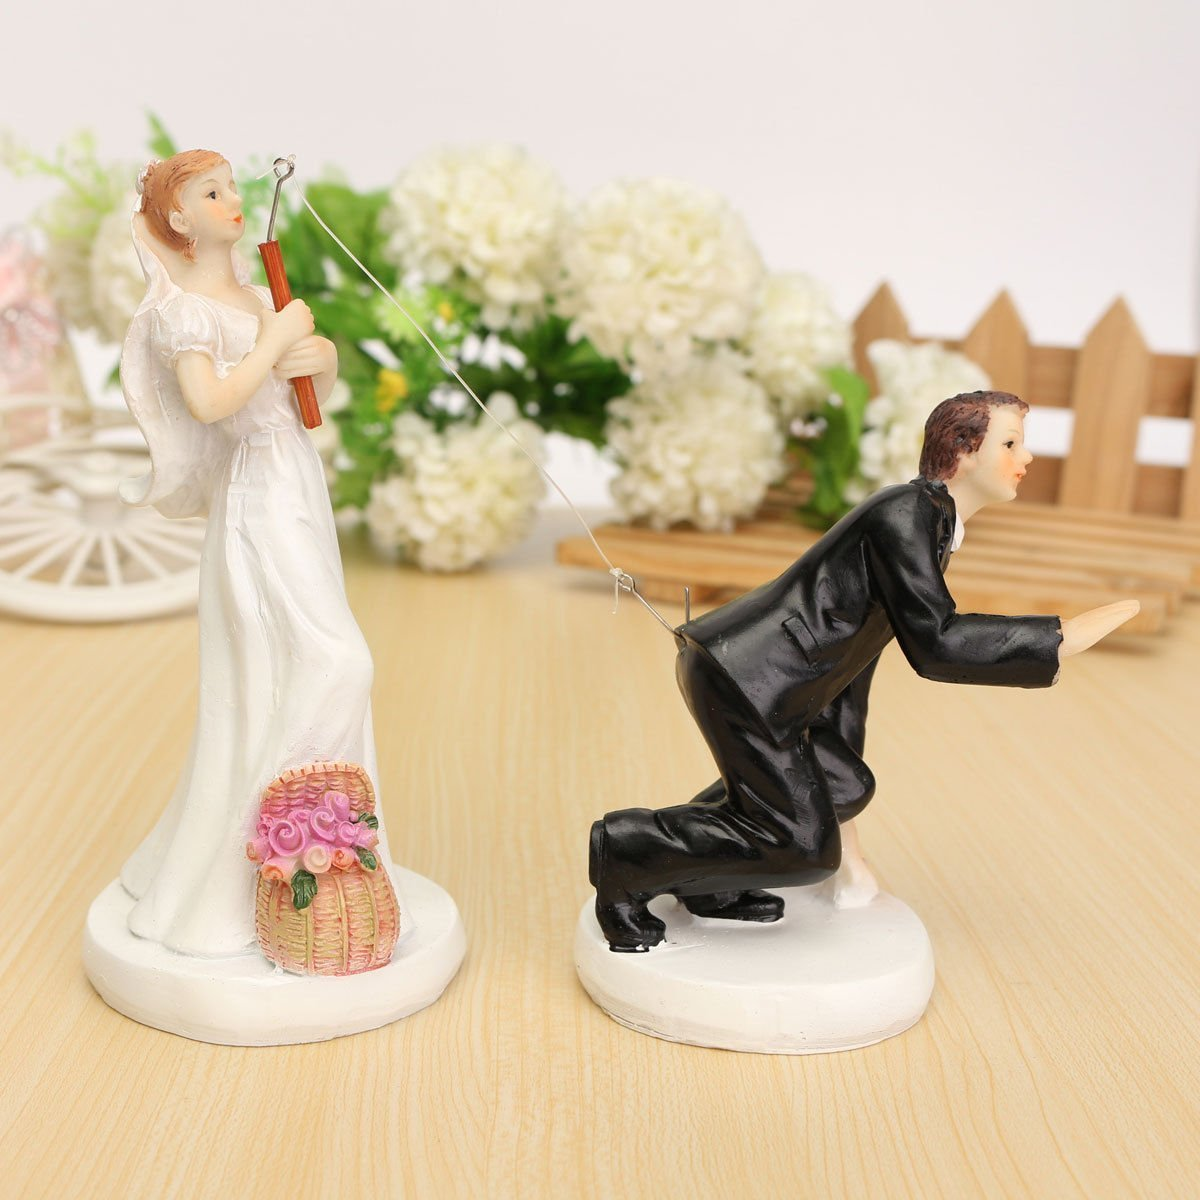 Amazon.com: Groom hooked COUPLE - TOOGOO(R)FUNNY ROMANTIC WEDDING ...